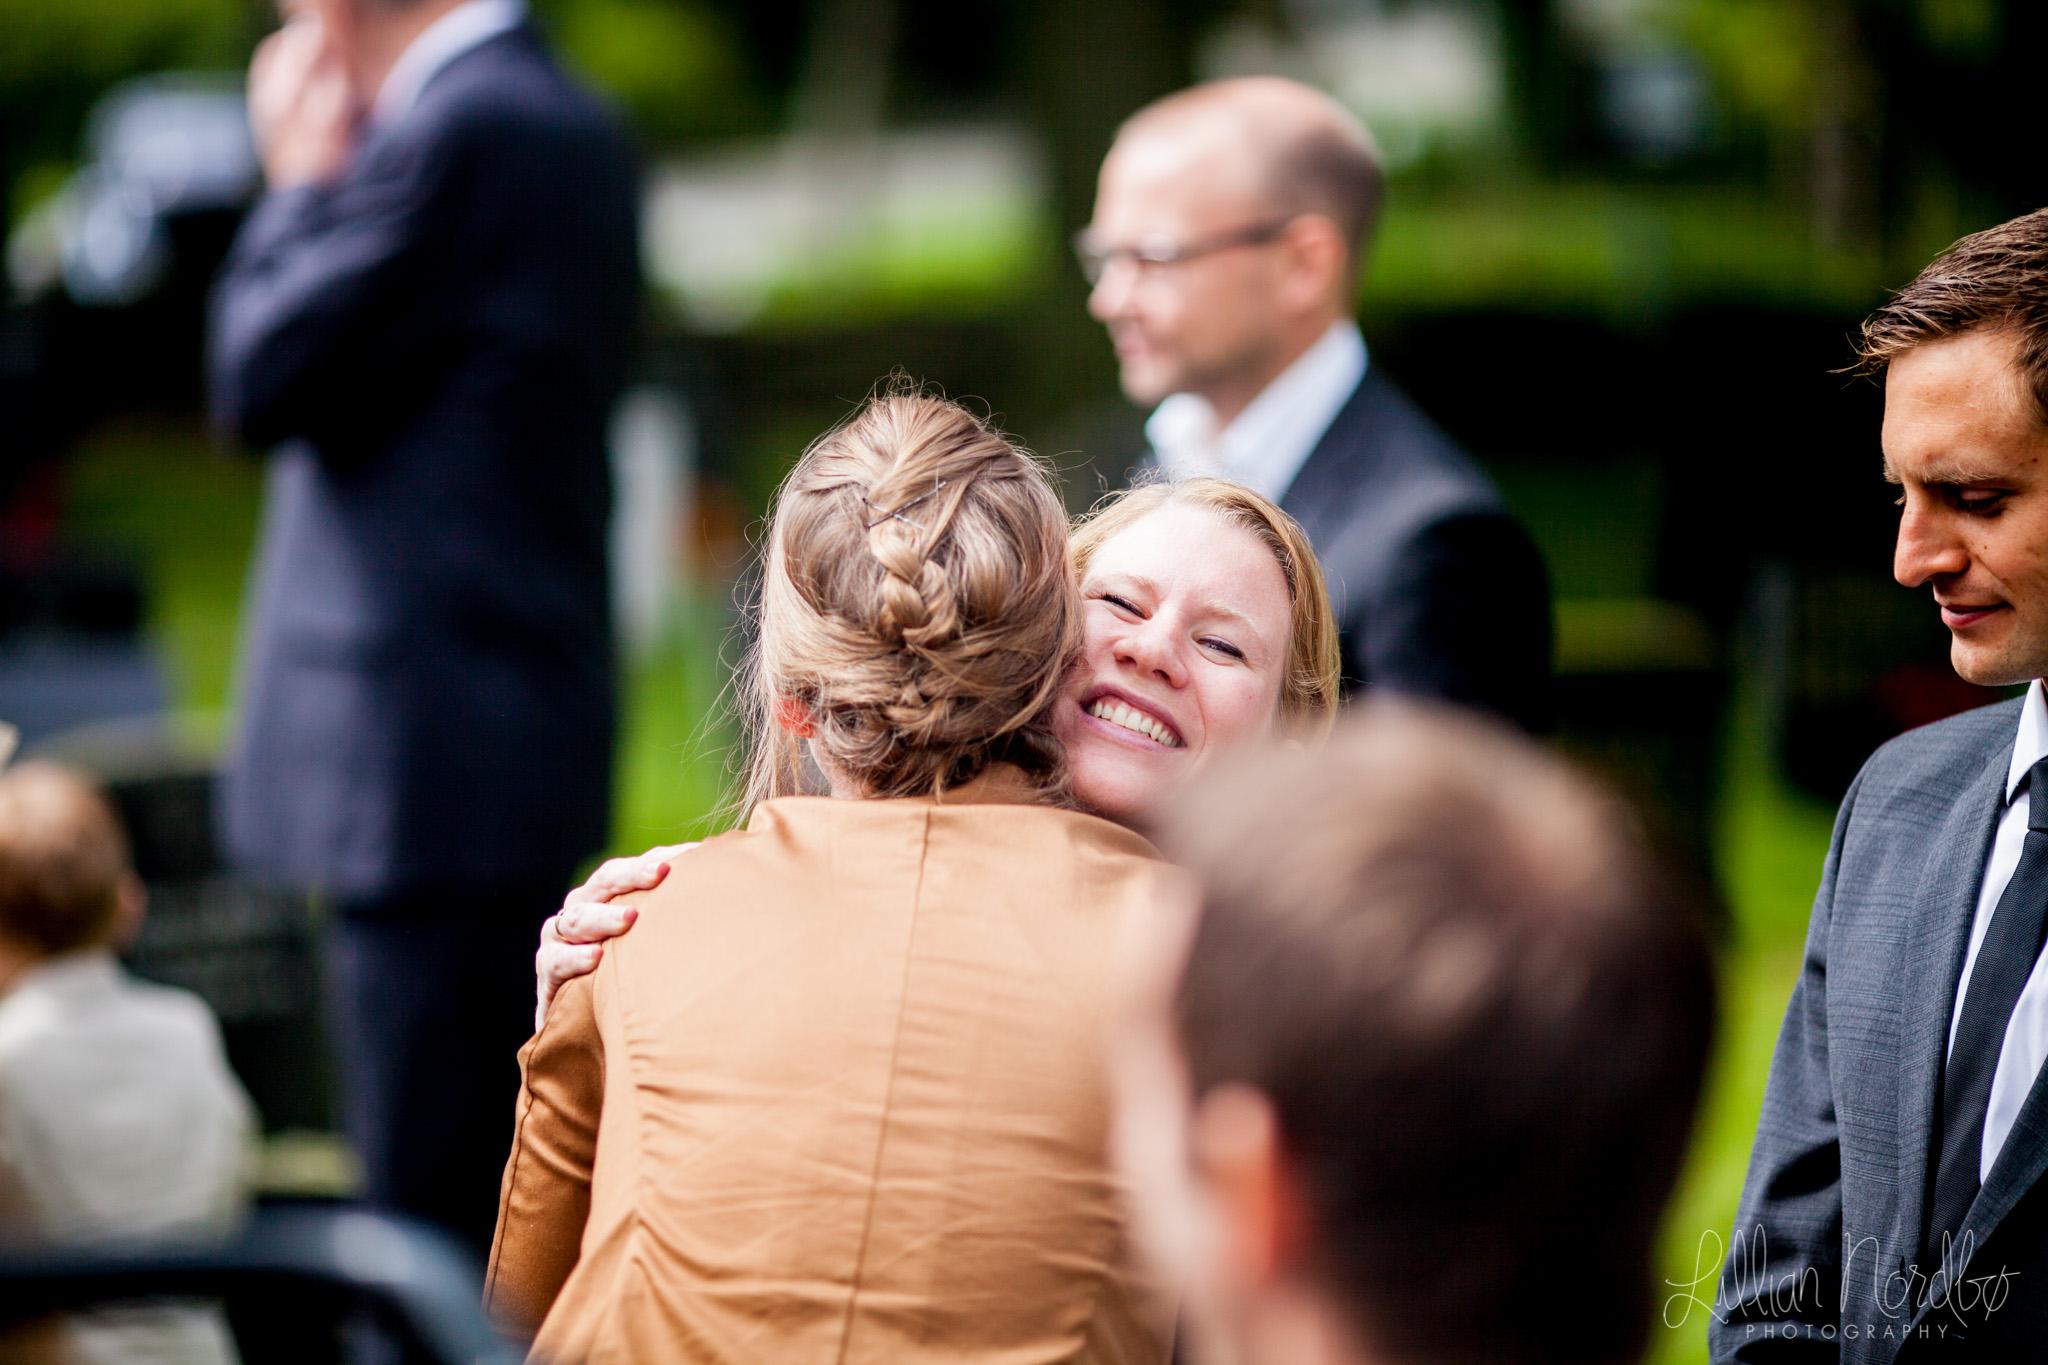 Fotograf Lillian Nordbø - tina+cato-19.jpg